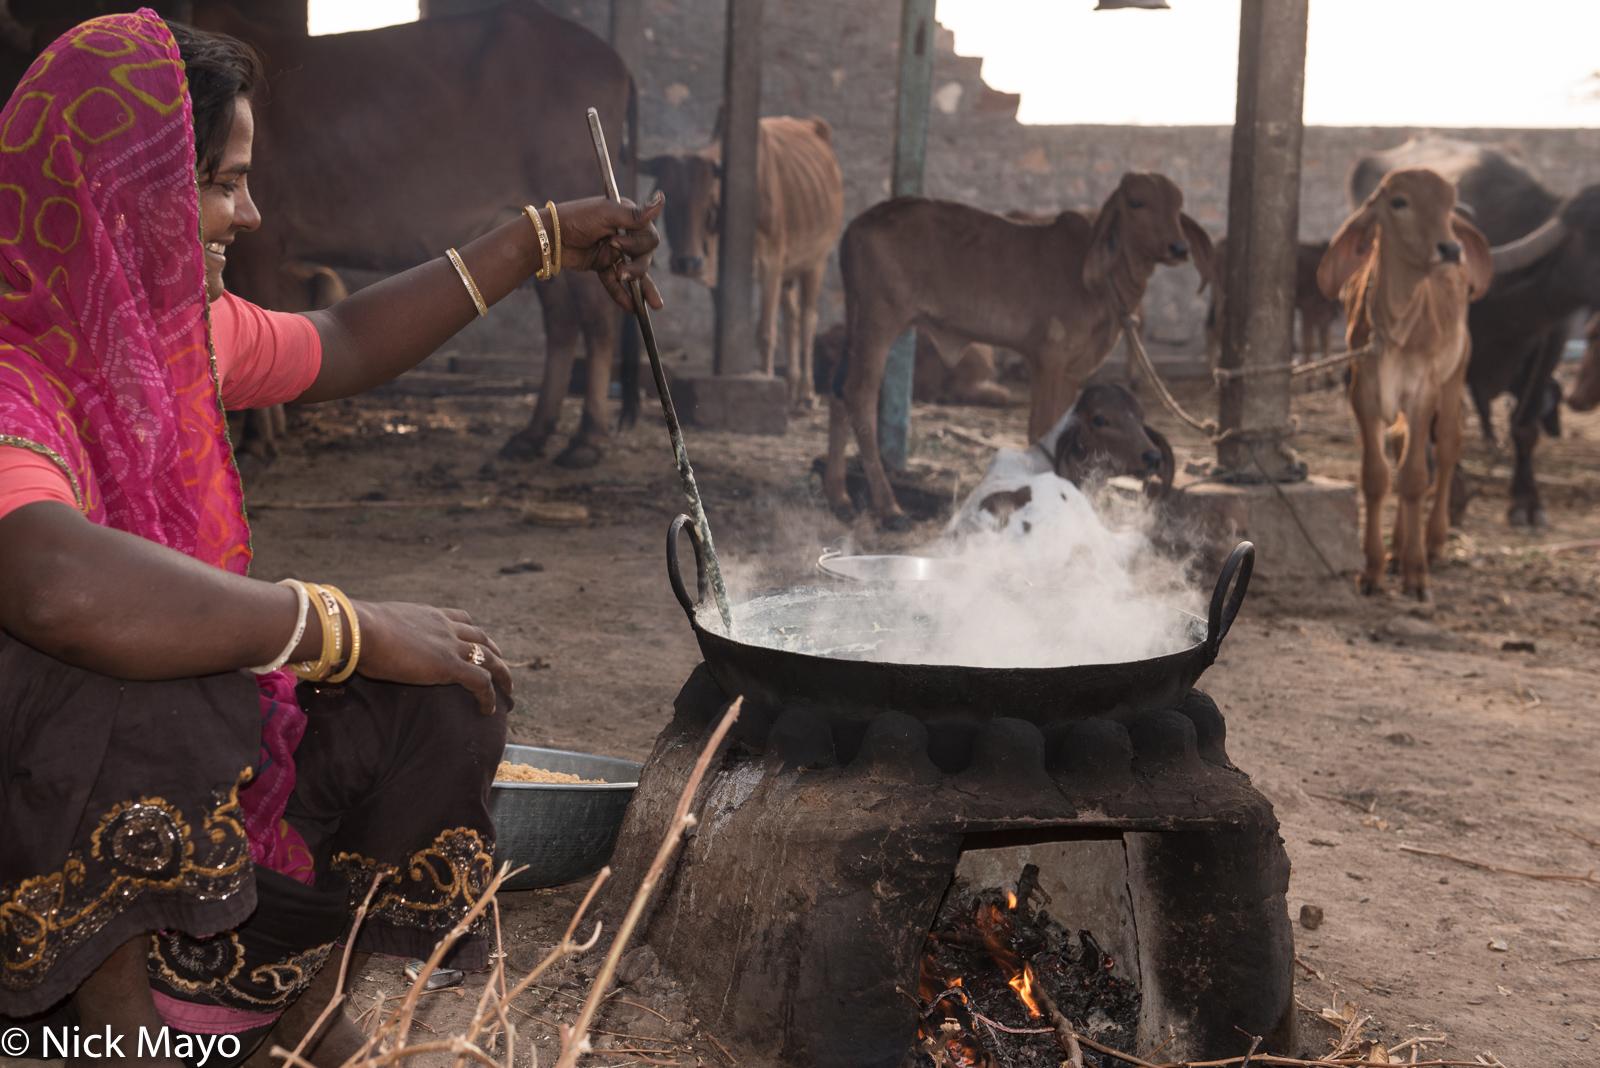 Bracelet, Cooking, Cow, Gujarat, Head Scarf, Hearth, India, Wok, photo